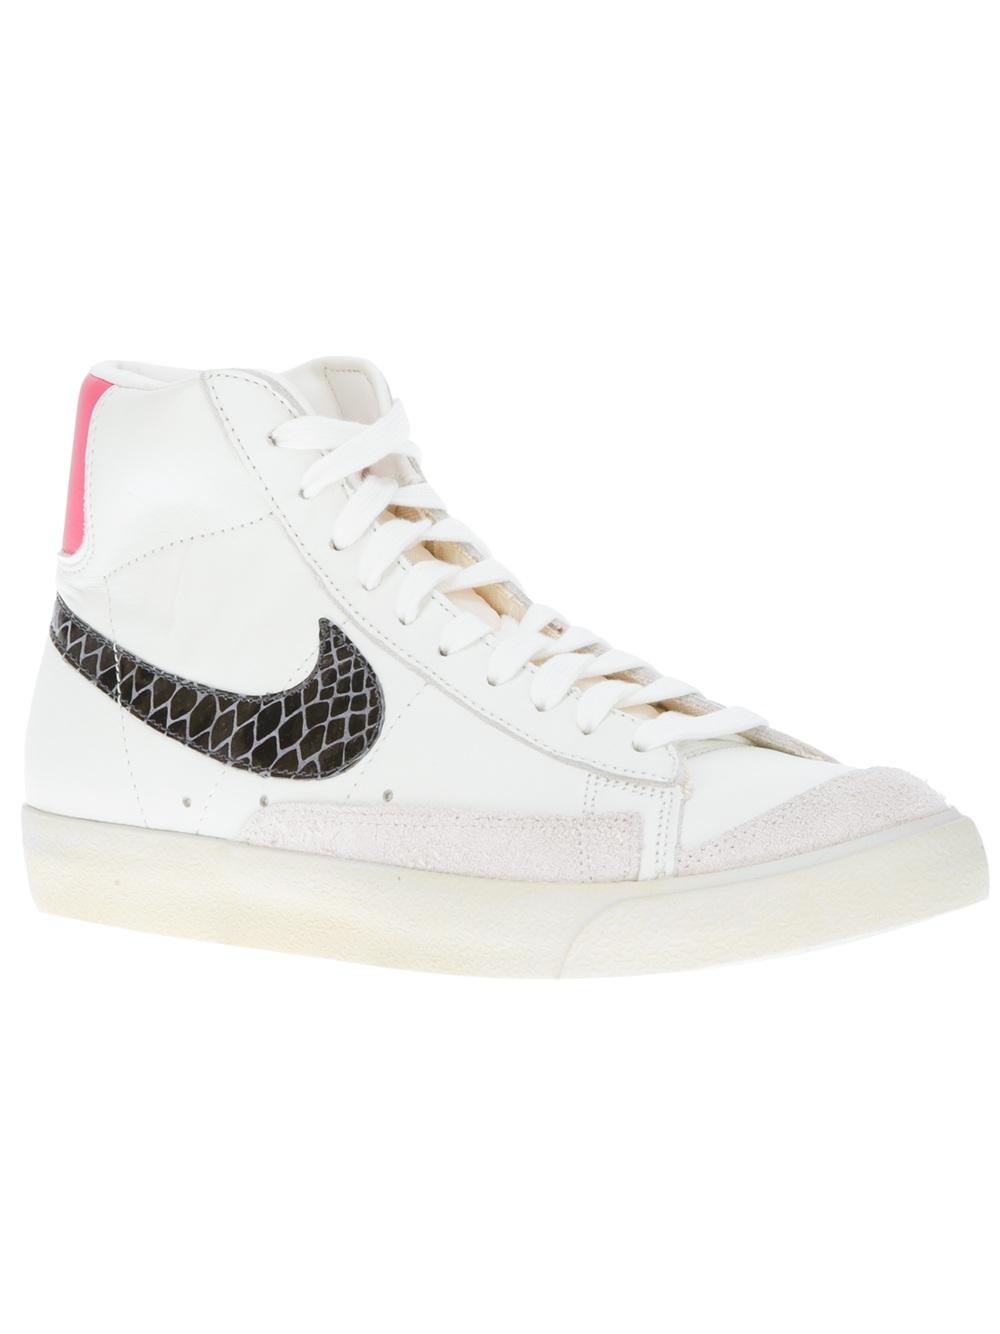 Nike Blazer Blanc Avec Heeler Tick Rouge